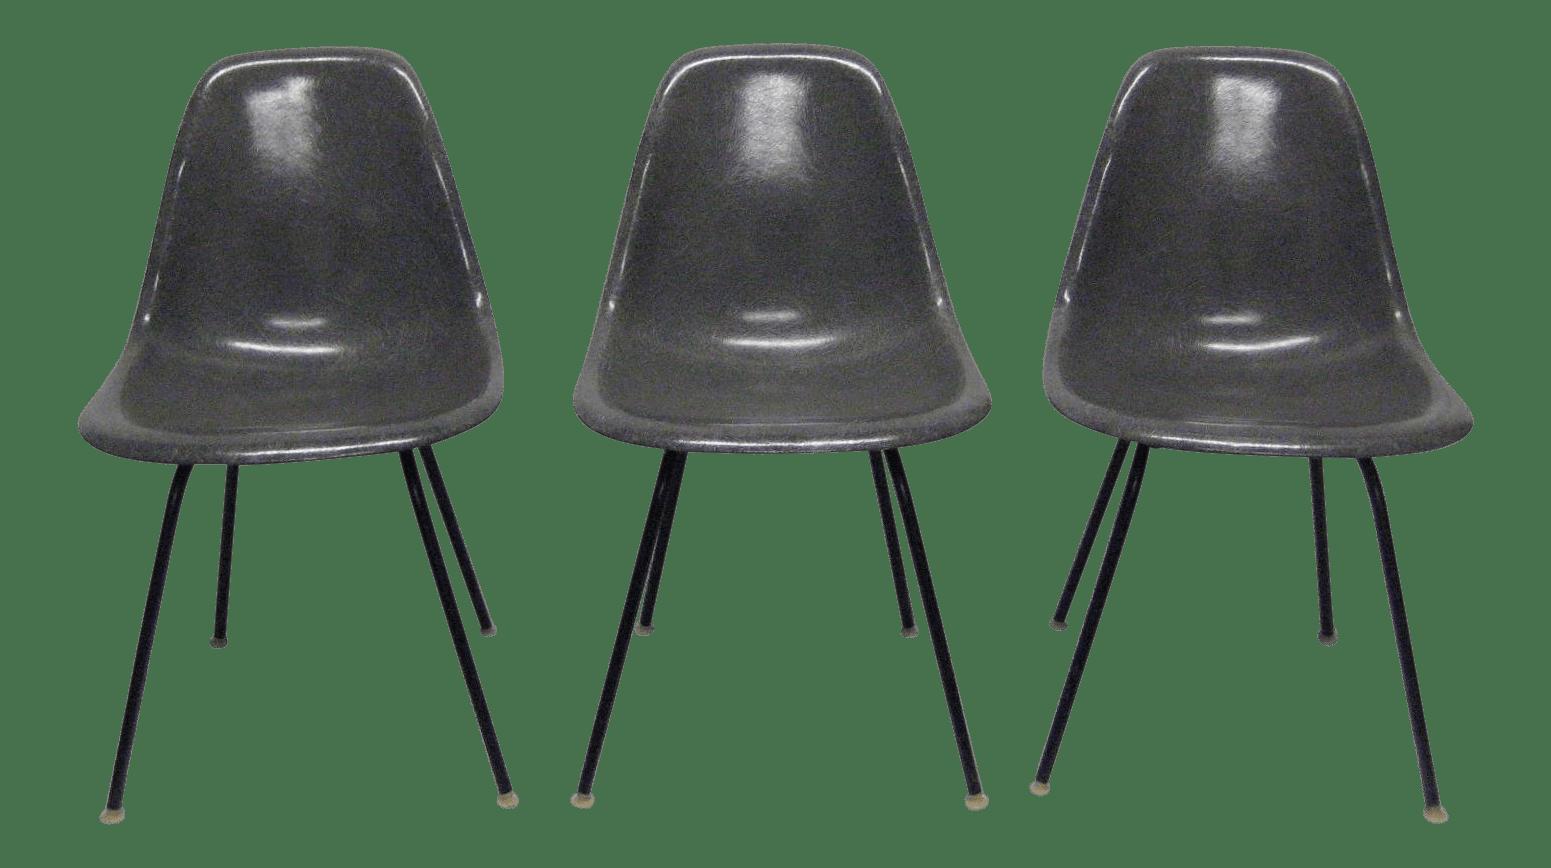 eames fiberglass chair ice cream sandwich 1957 mid century modern charles chairs set of 3 chairish